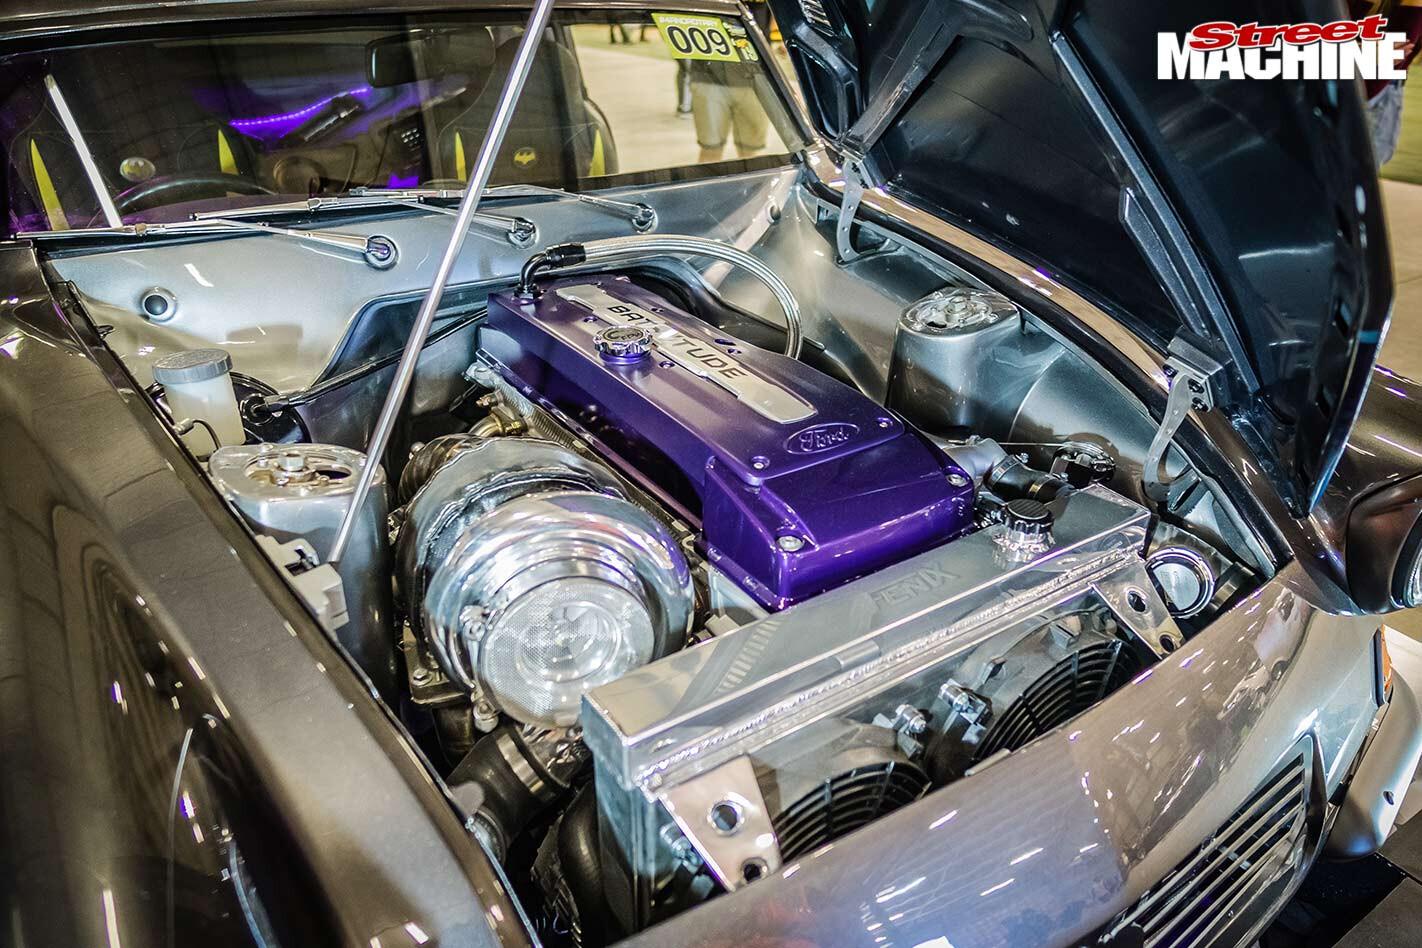 Batmobile engine bay